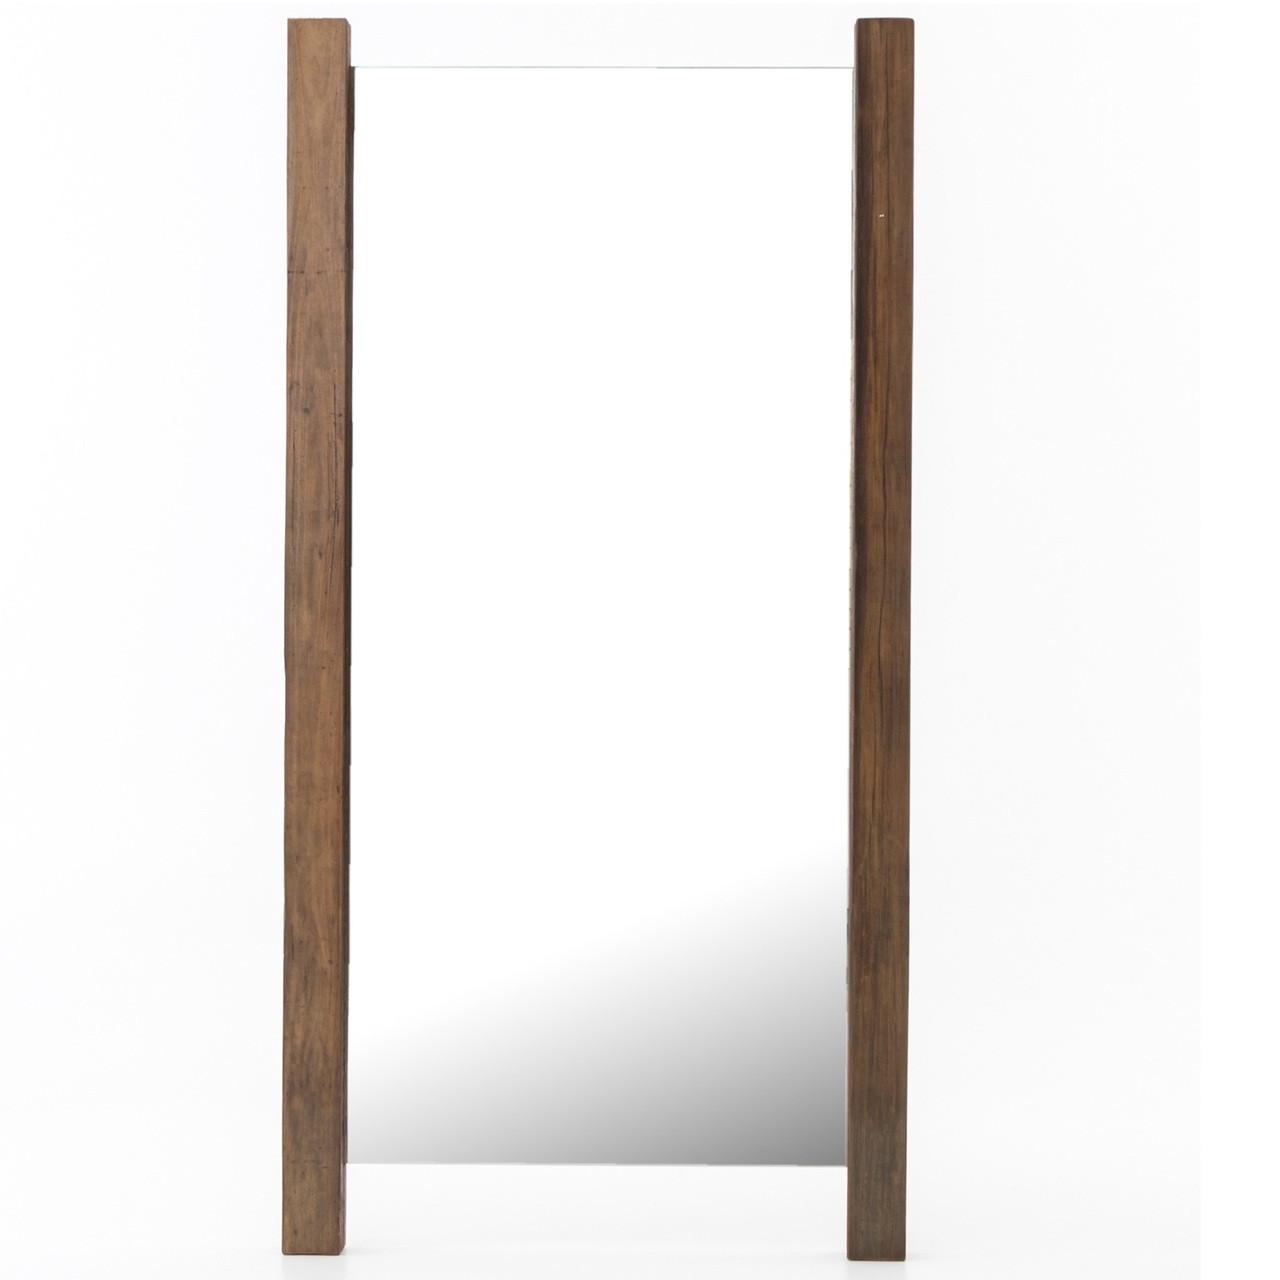 Beldon Reclaimed Wood Rustic Floor Mirror 84\